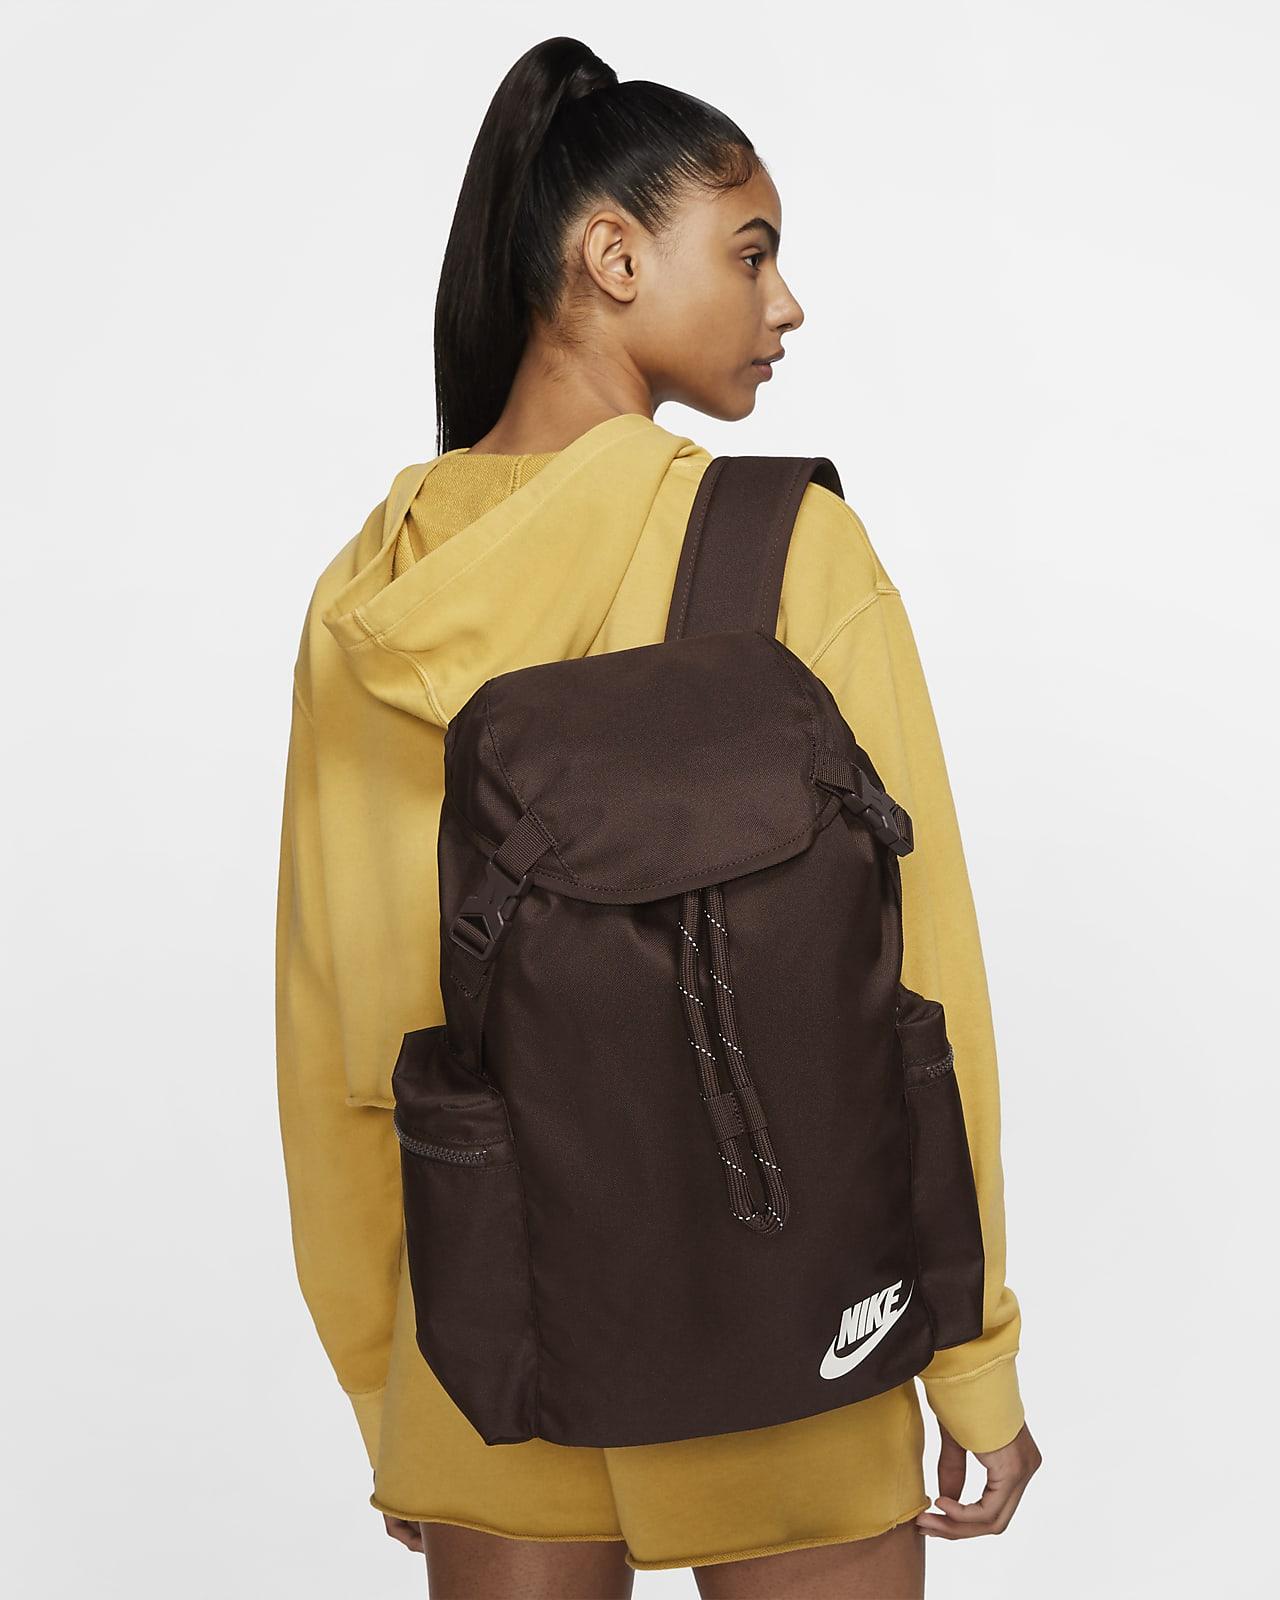 Flexible regla basura  Nike Heritage Rucksack. Nike LU